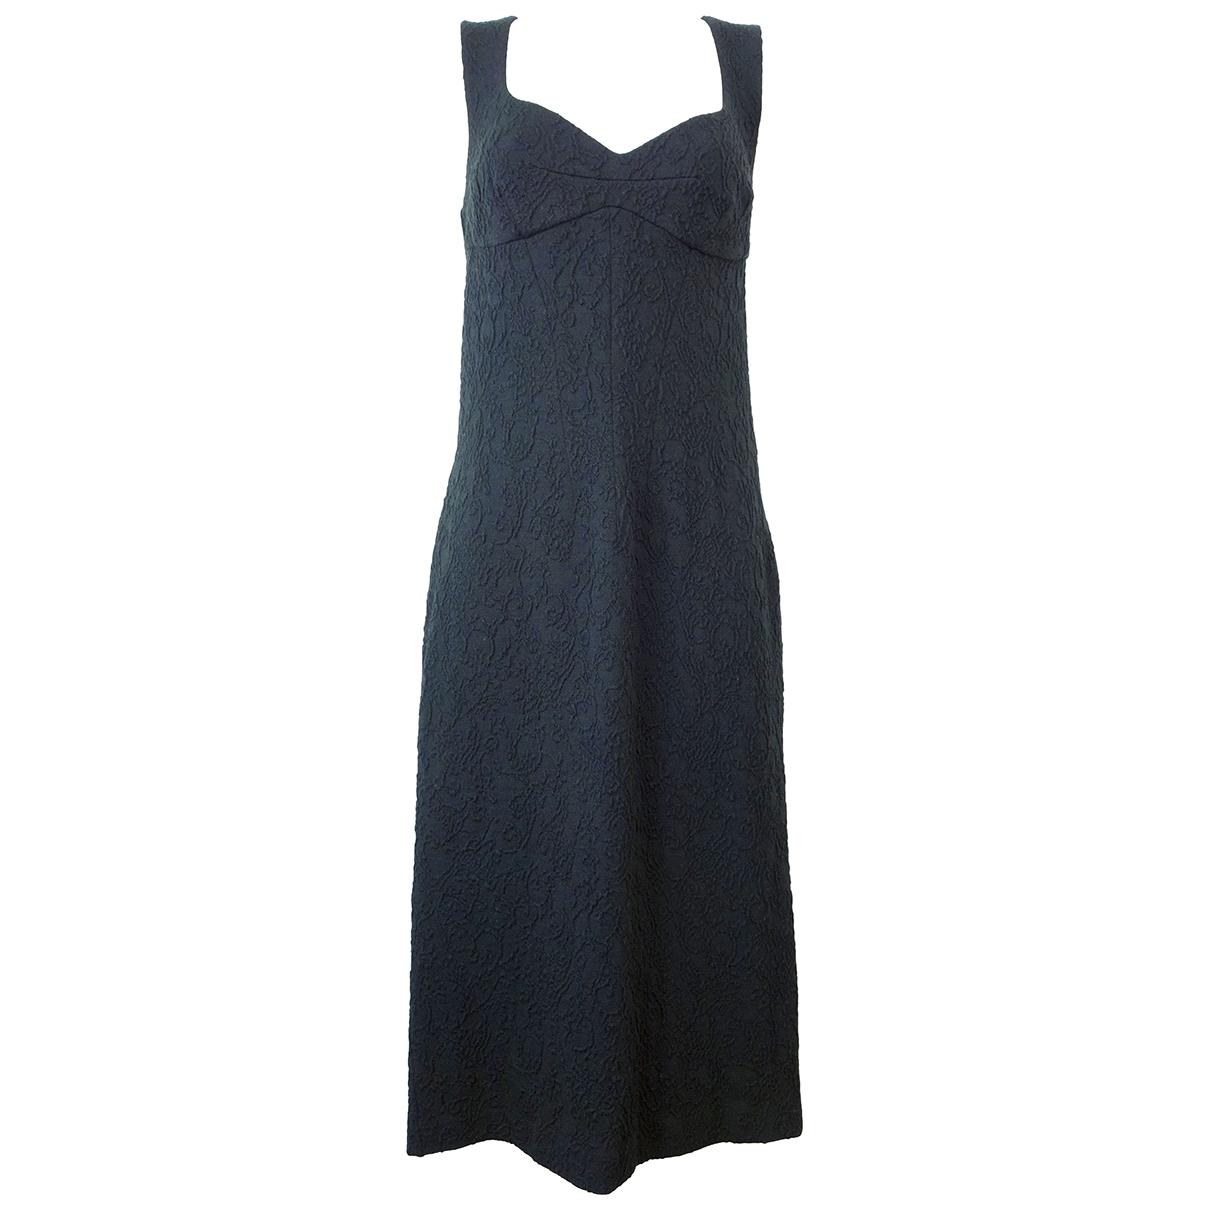 D&g \N Black Wool dress for Women M International